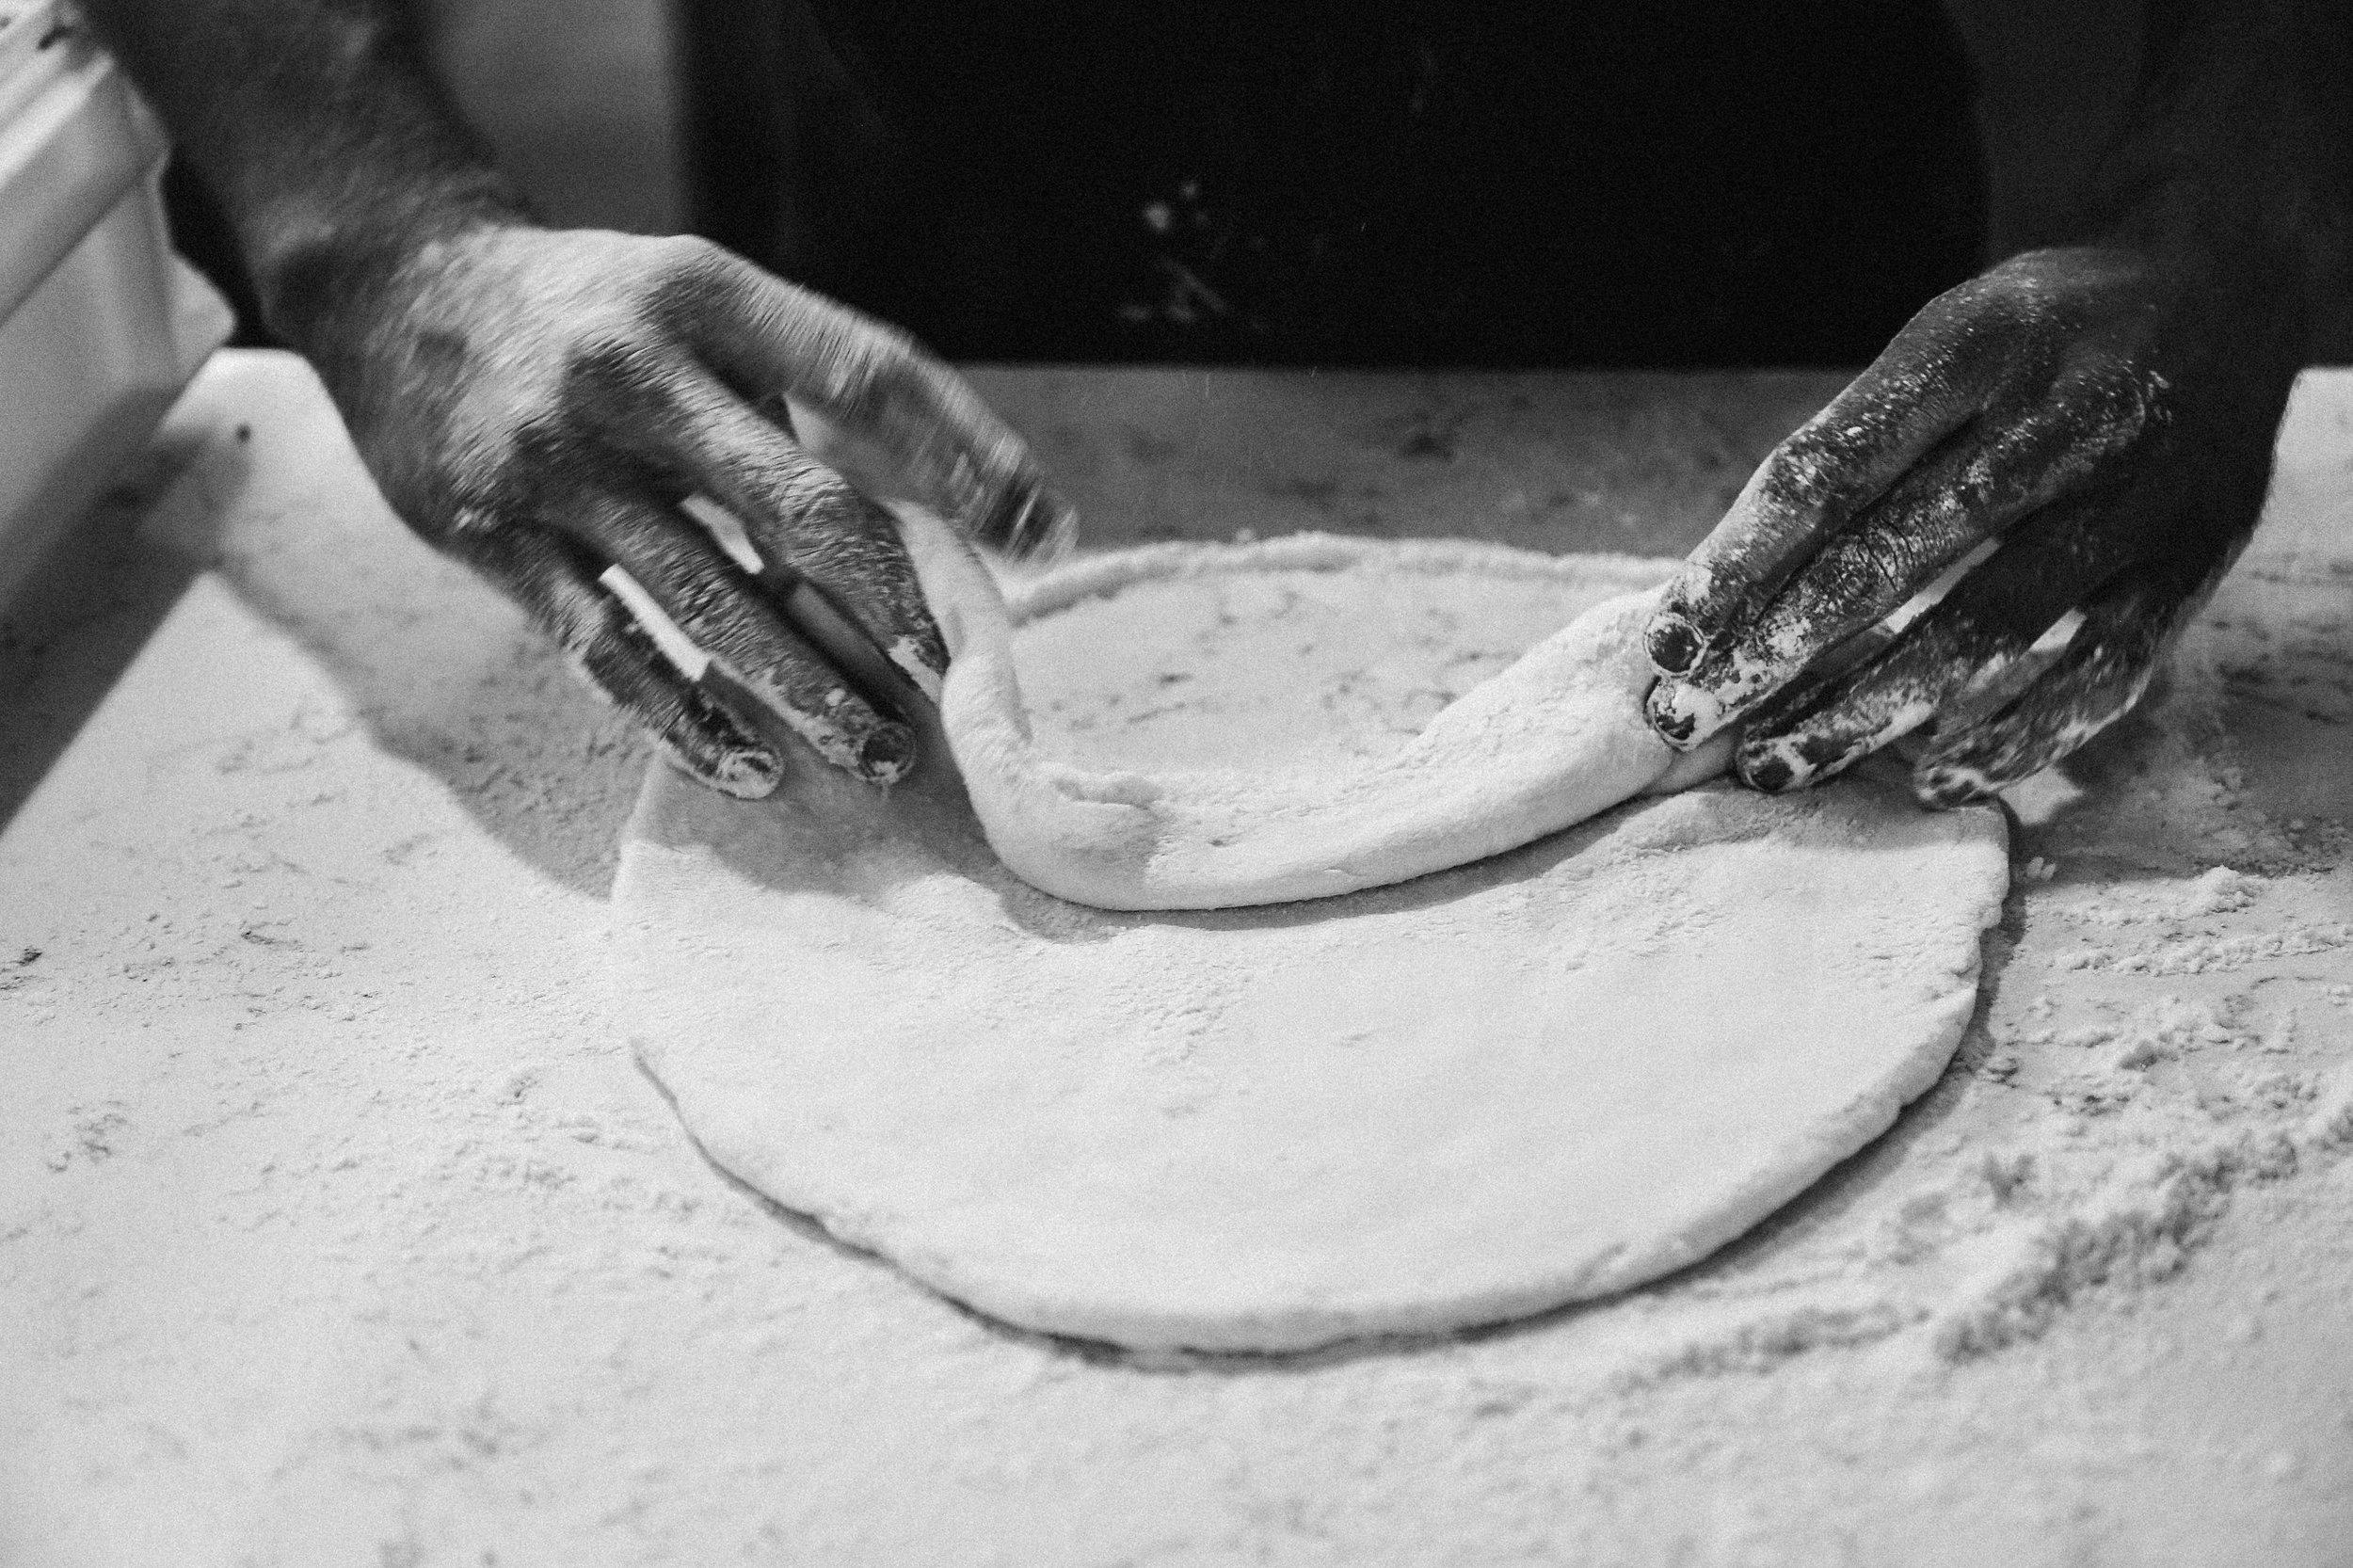 flour-house-slo-kendra-aronson-dough-6.jpg